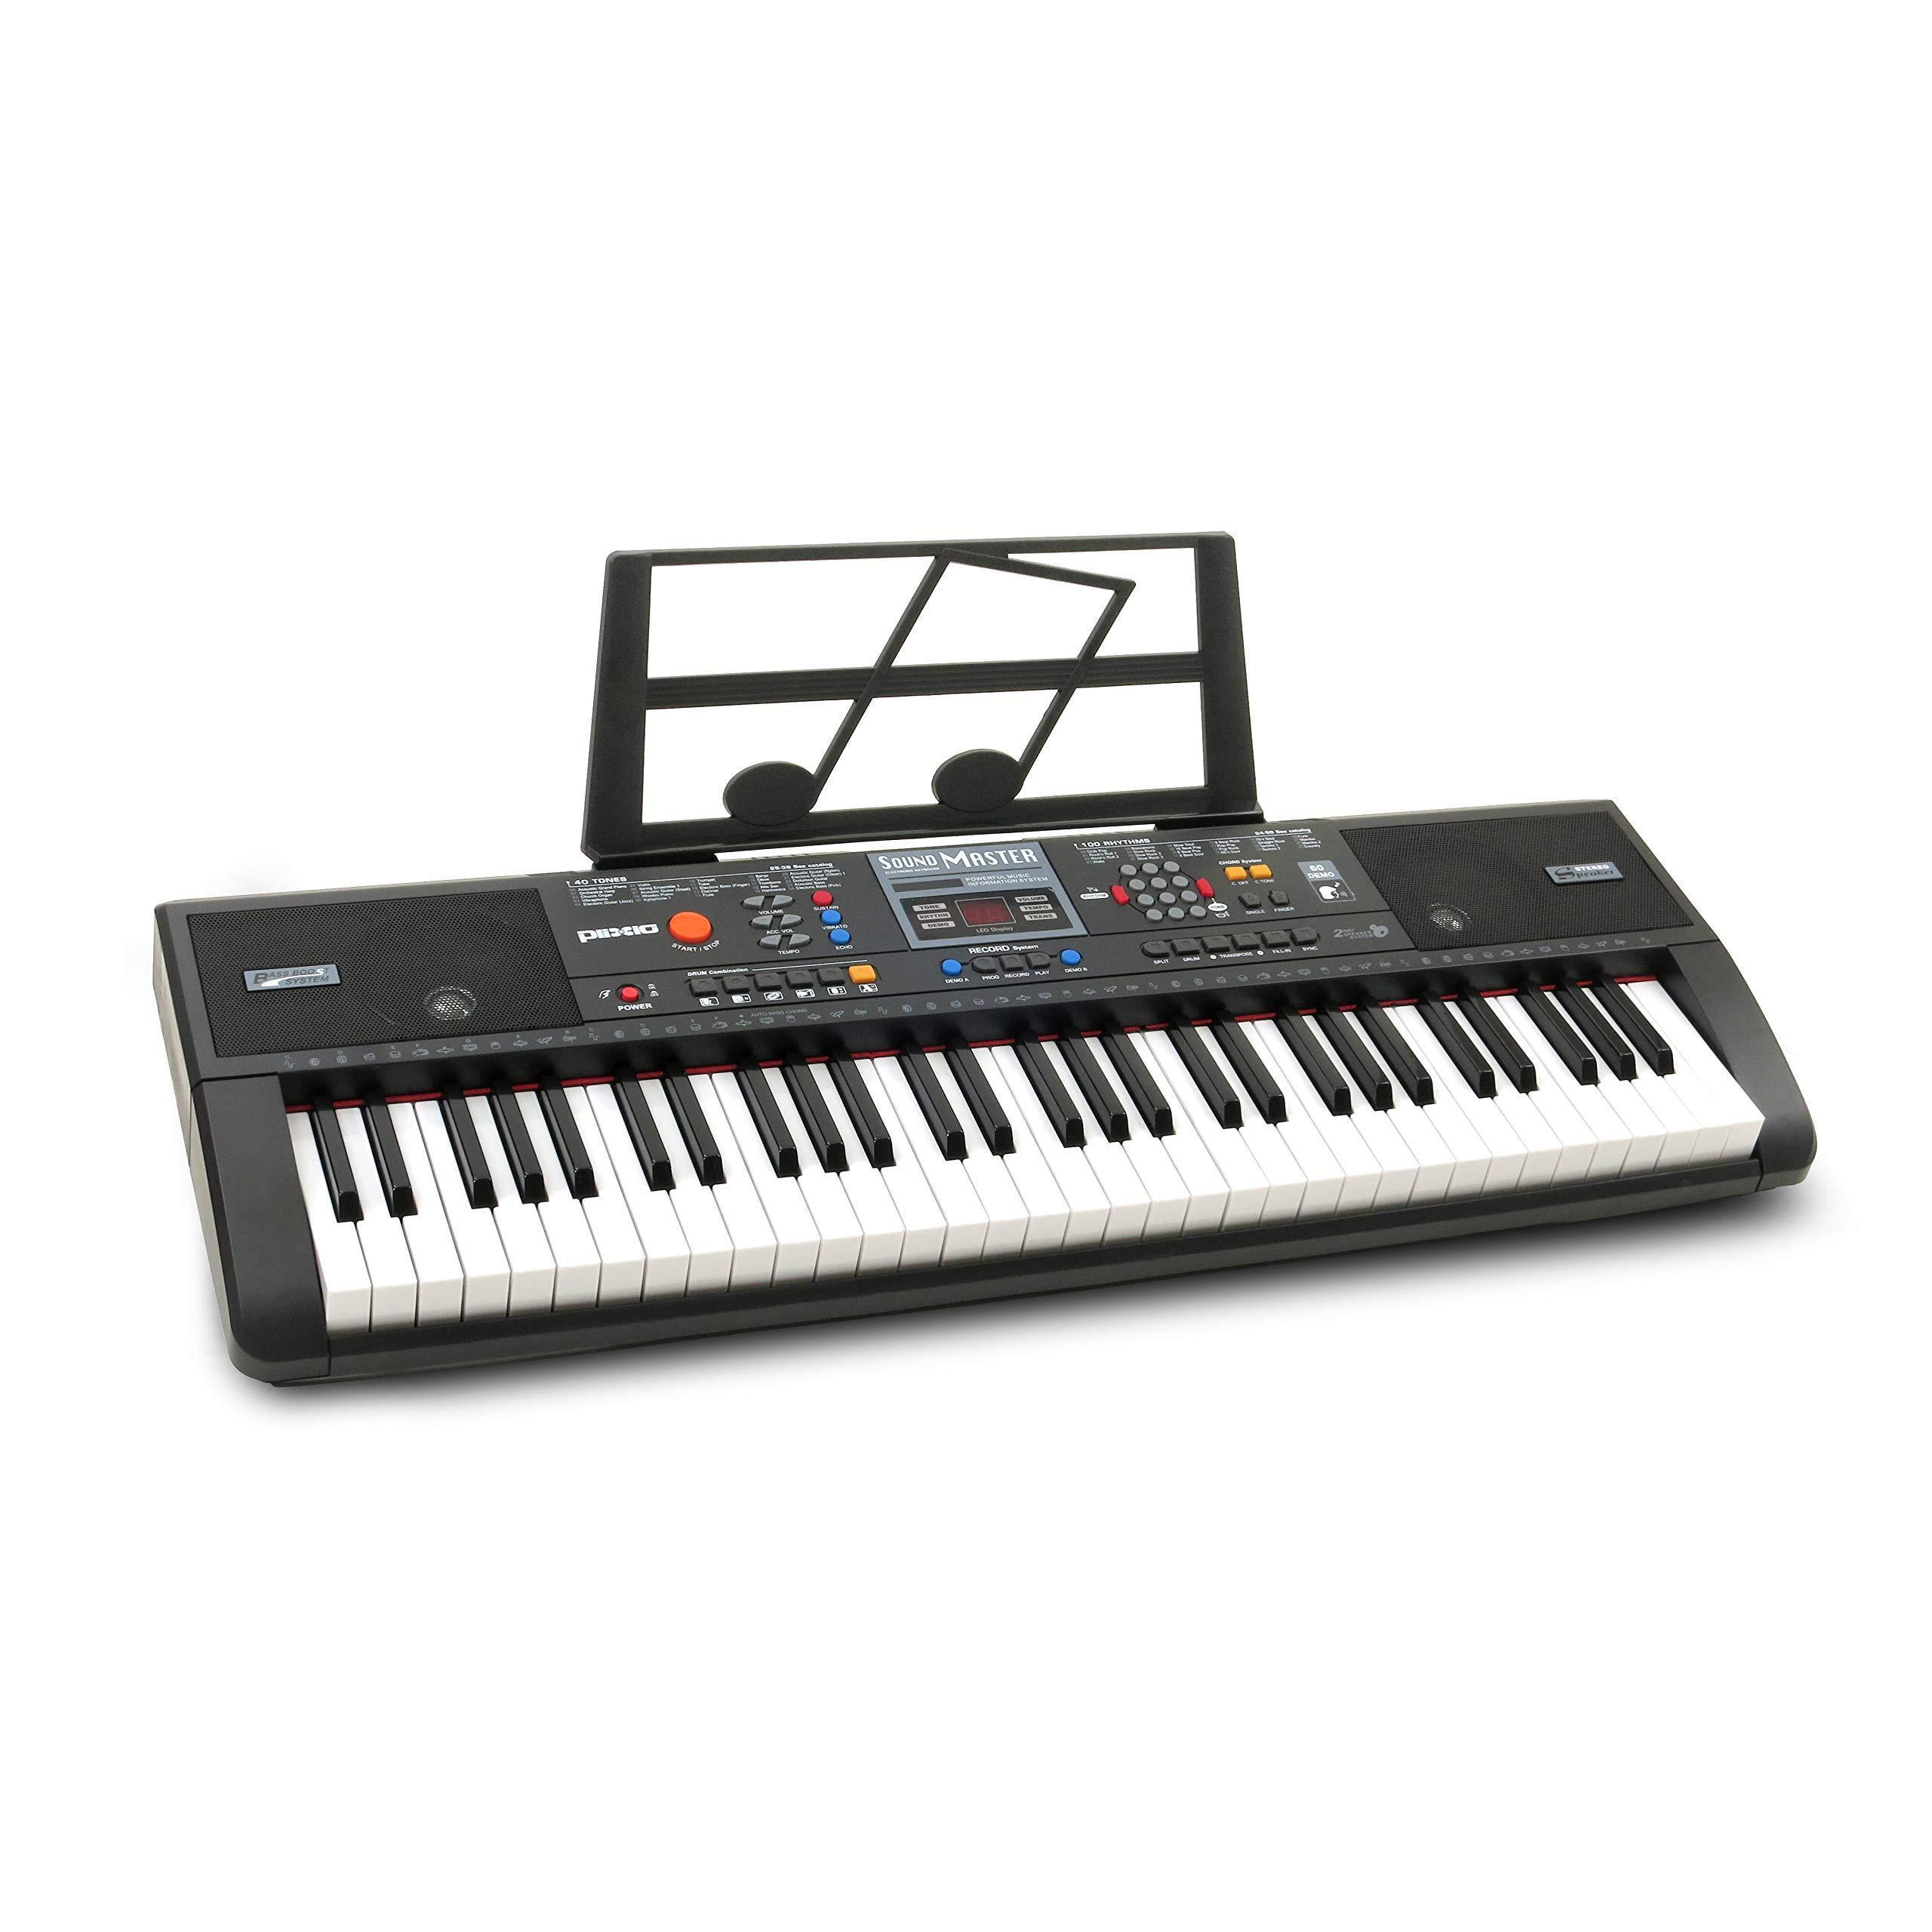 Plixio 61-Key Digital Electric Piano Keyboard & Sheet Music Stand - Portable Electronic Keyboard for Beginners (Kids & Adults) (Renewed) by Plixio (Image #1)